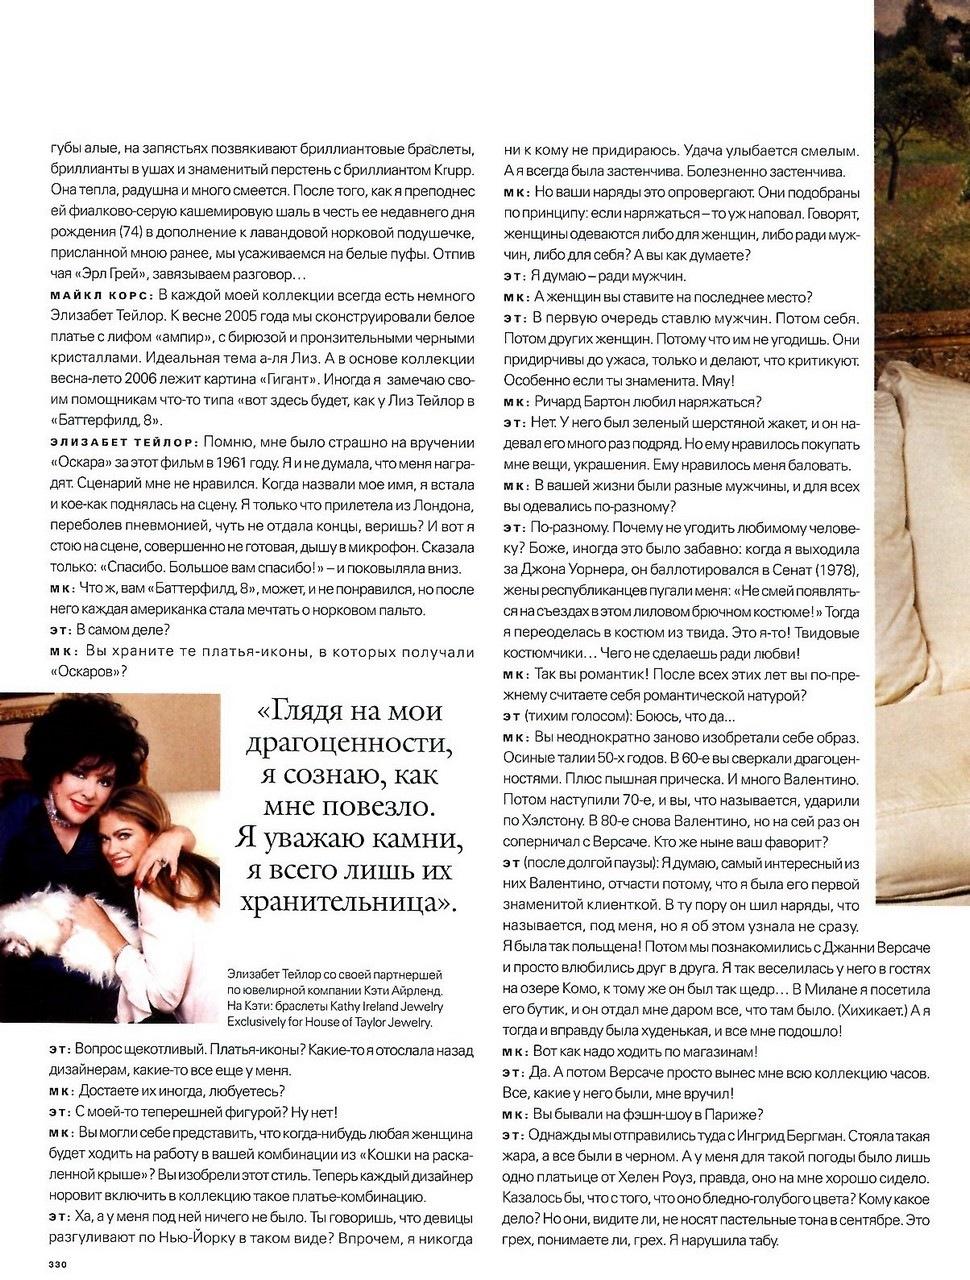 http://data14.gallery.ru/albums/gallery/74091--42408861--uef70e.jpg